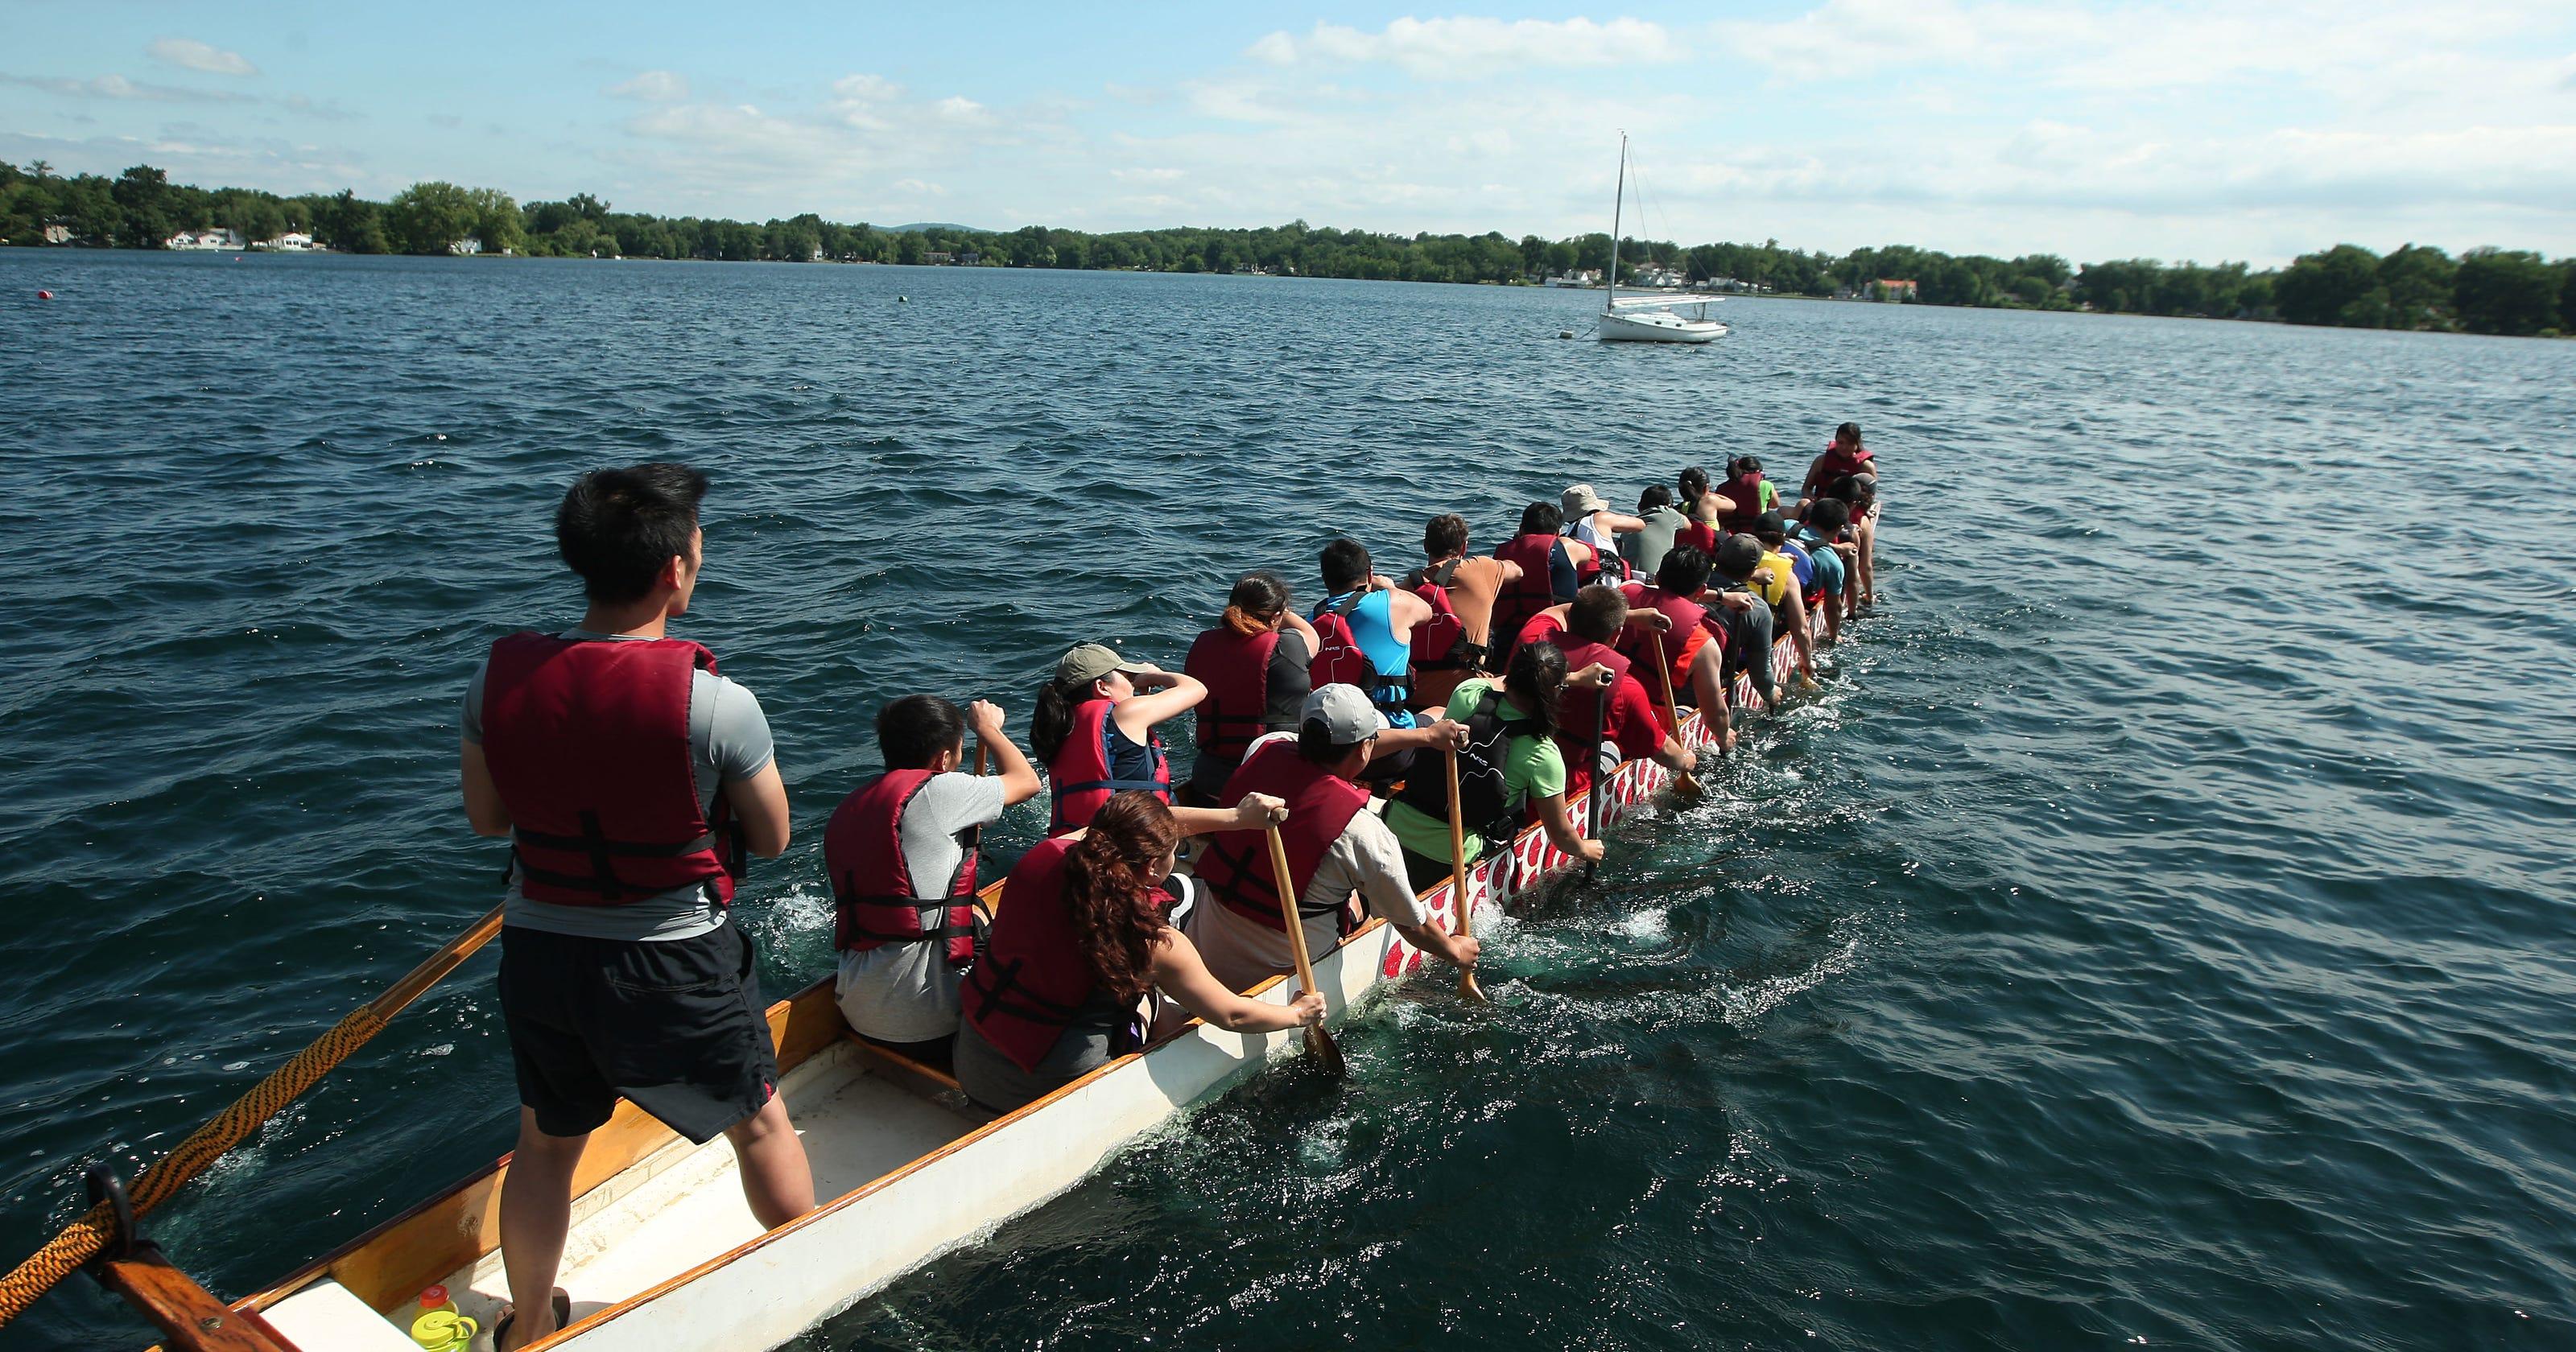 Lake Parsippany kicks off summer, seeks to expand membership